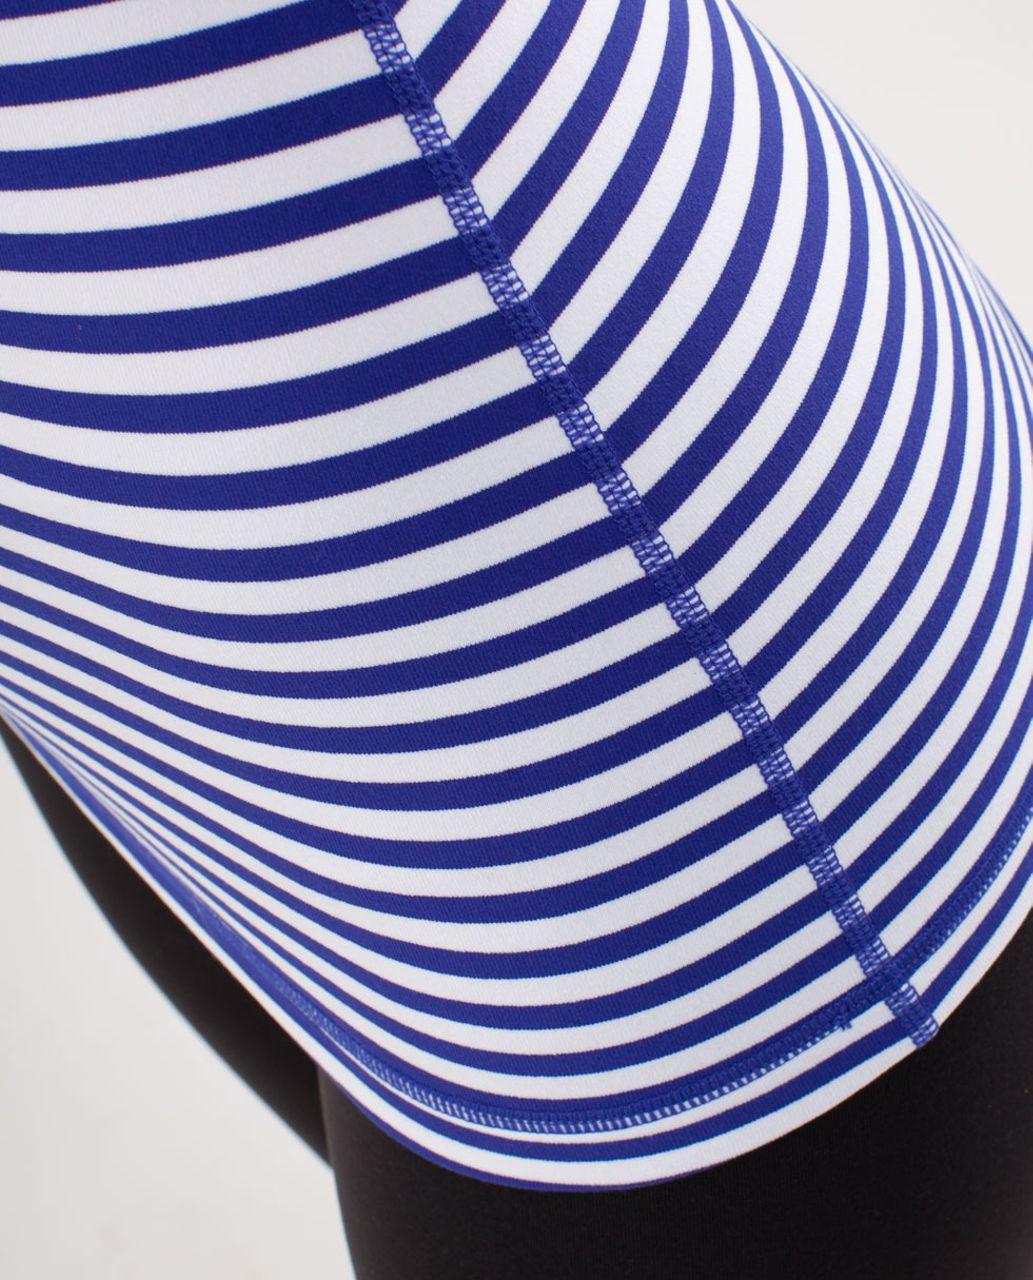 Lululemon Power Y Tank - Pigment Blue White Narrow Bold Stripe